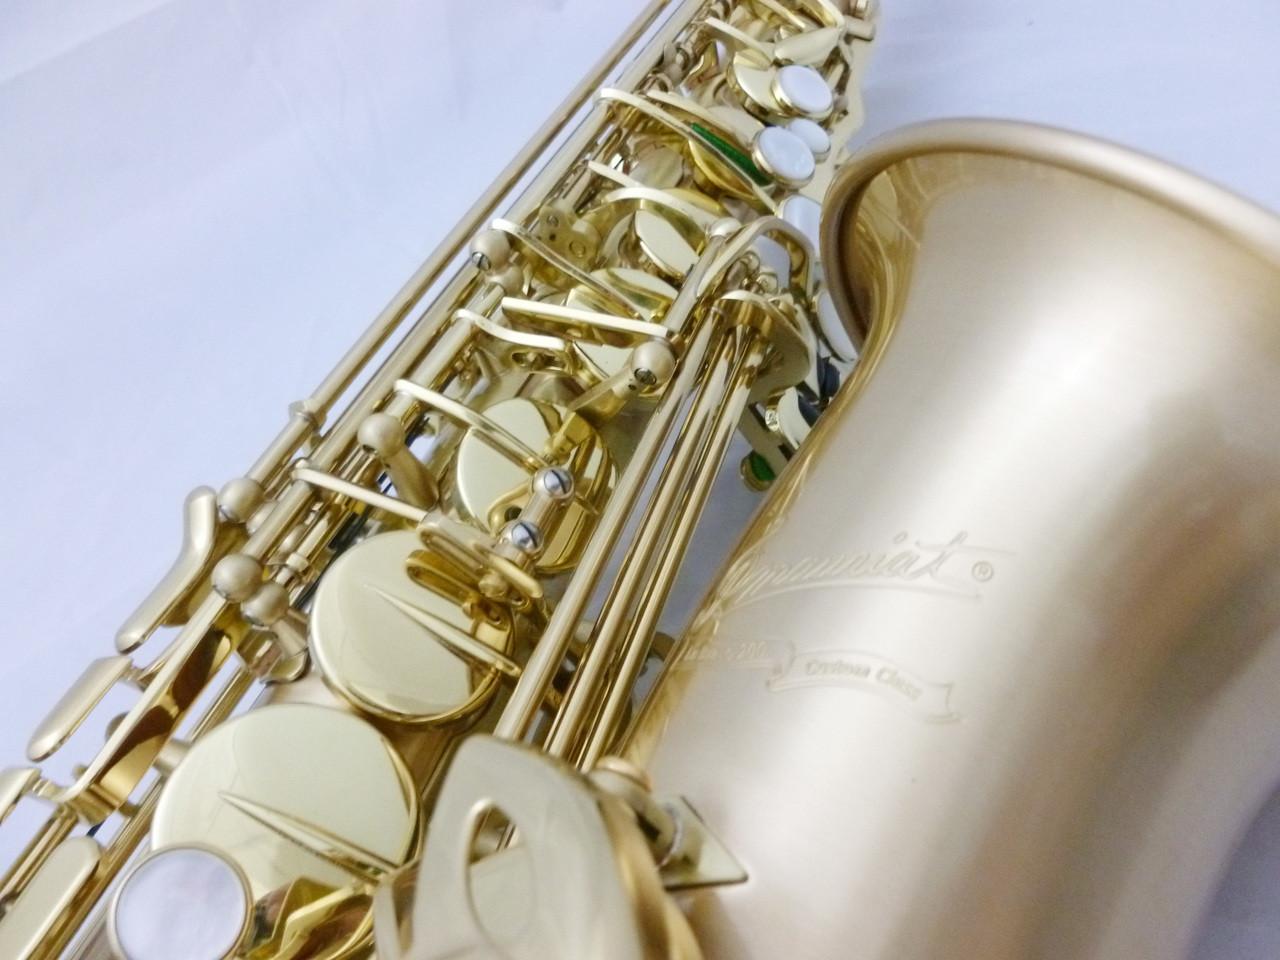 P Mauriat Le Bravo 200 Alto Saxophone 3